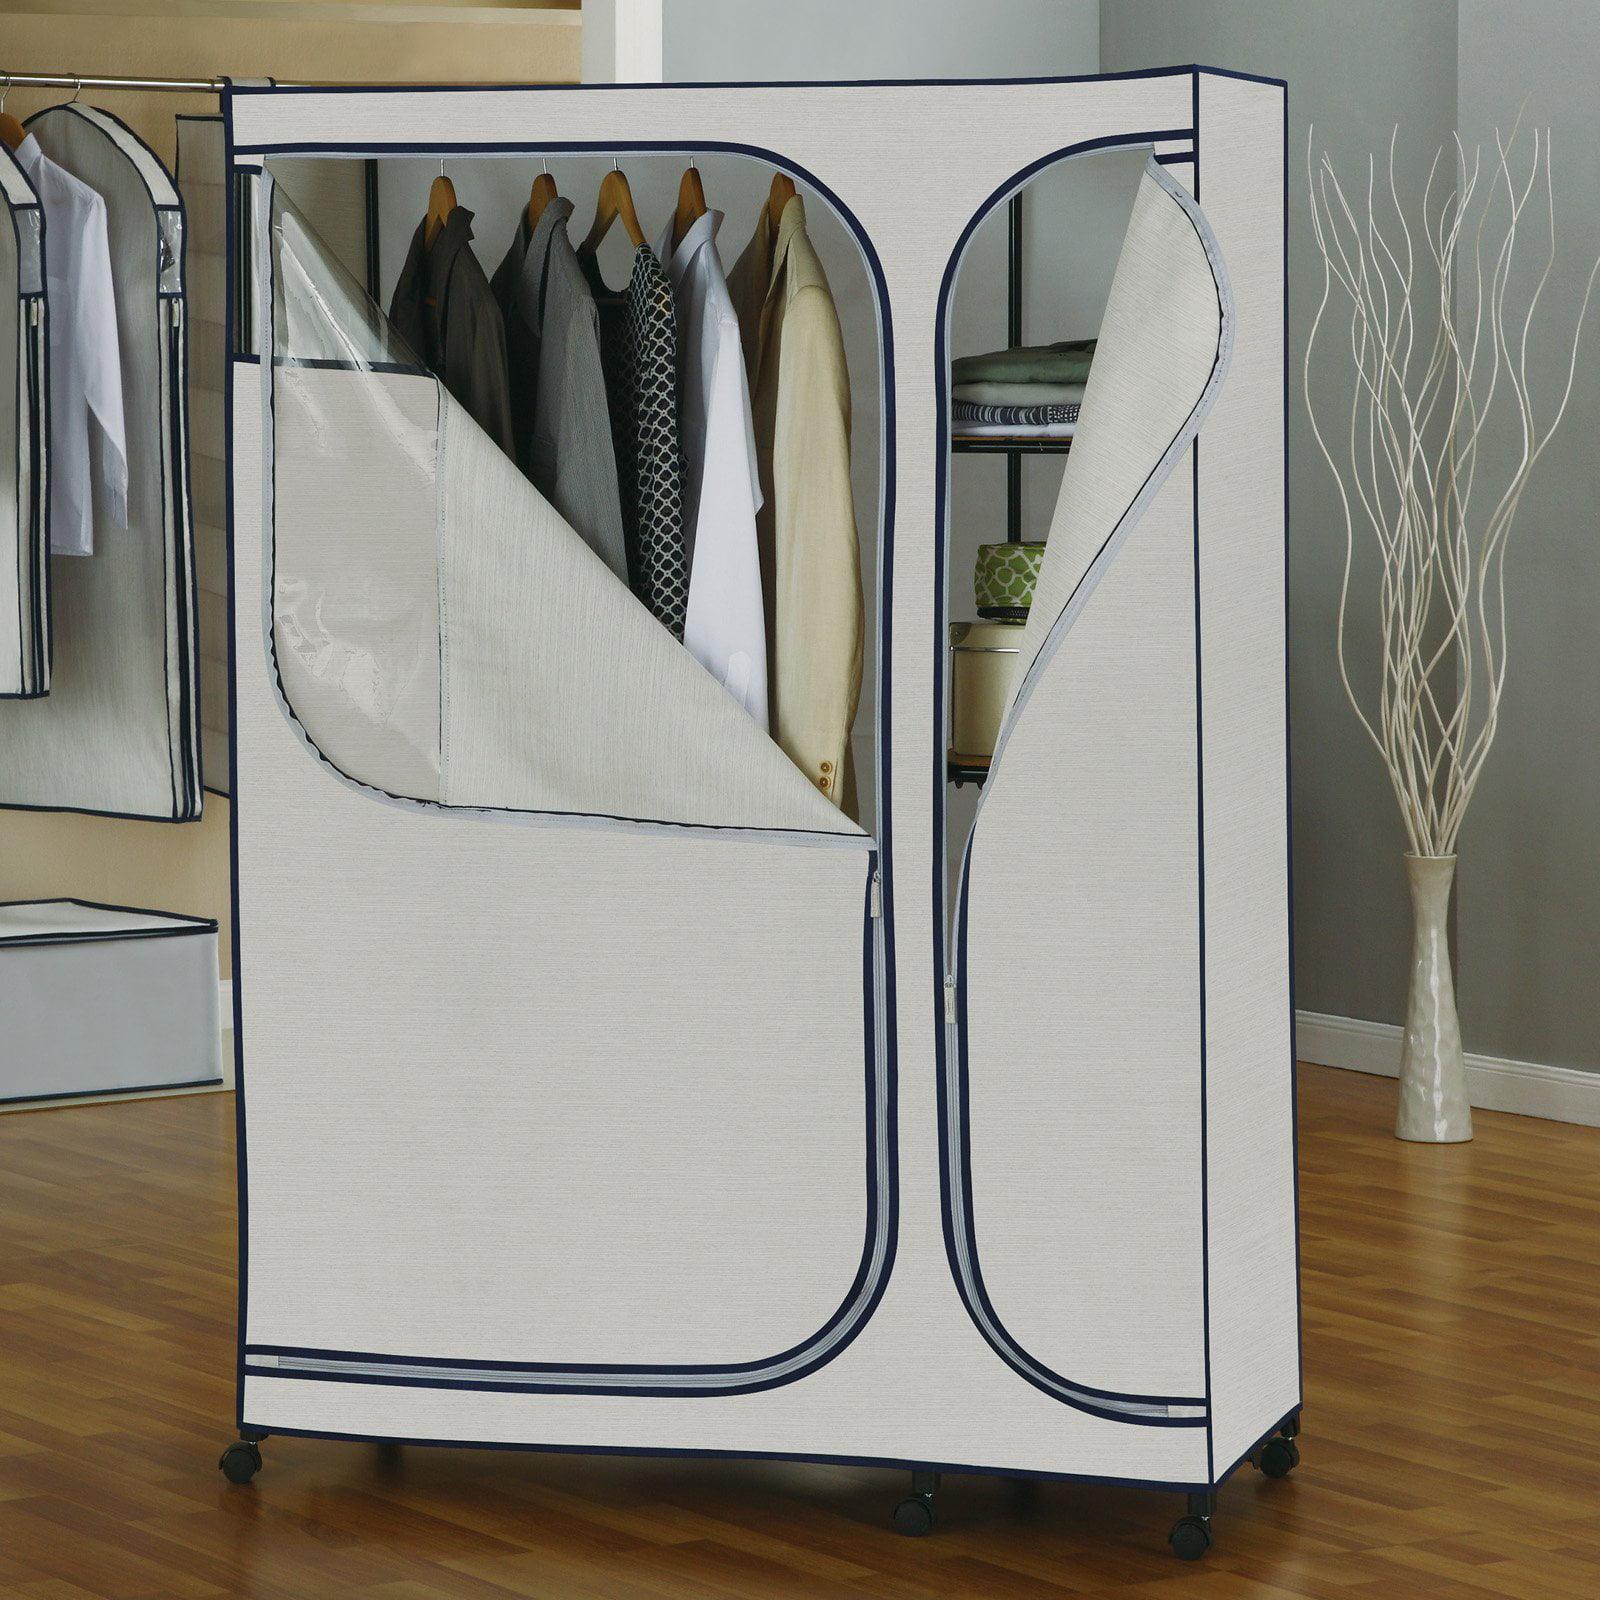 Storage Closet Armoire Wardrobe - Walmart.com - Walmart.com